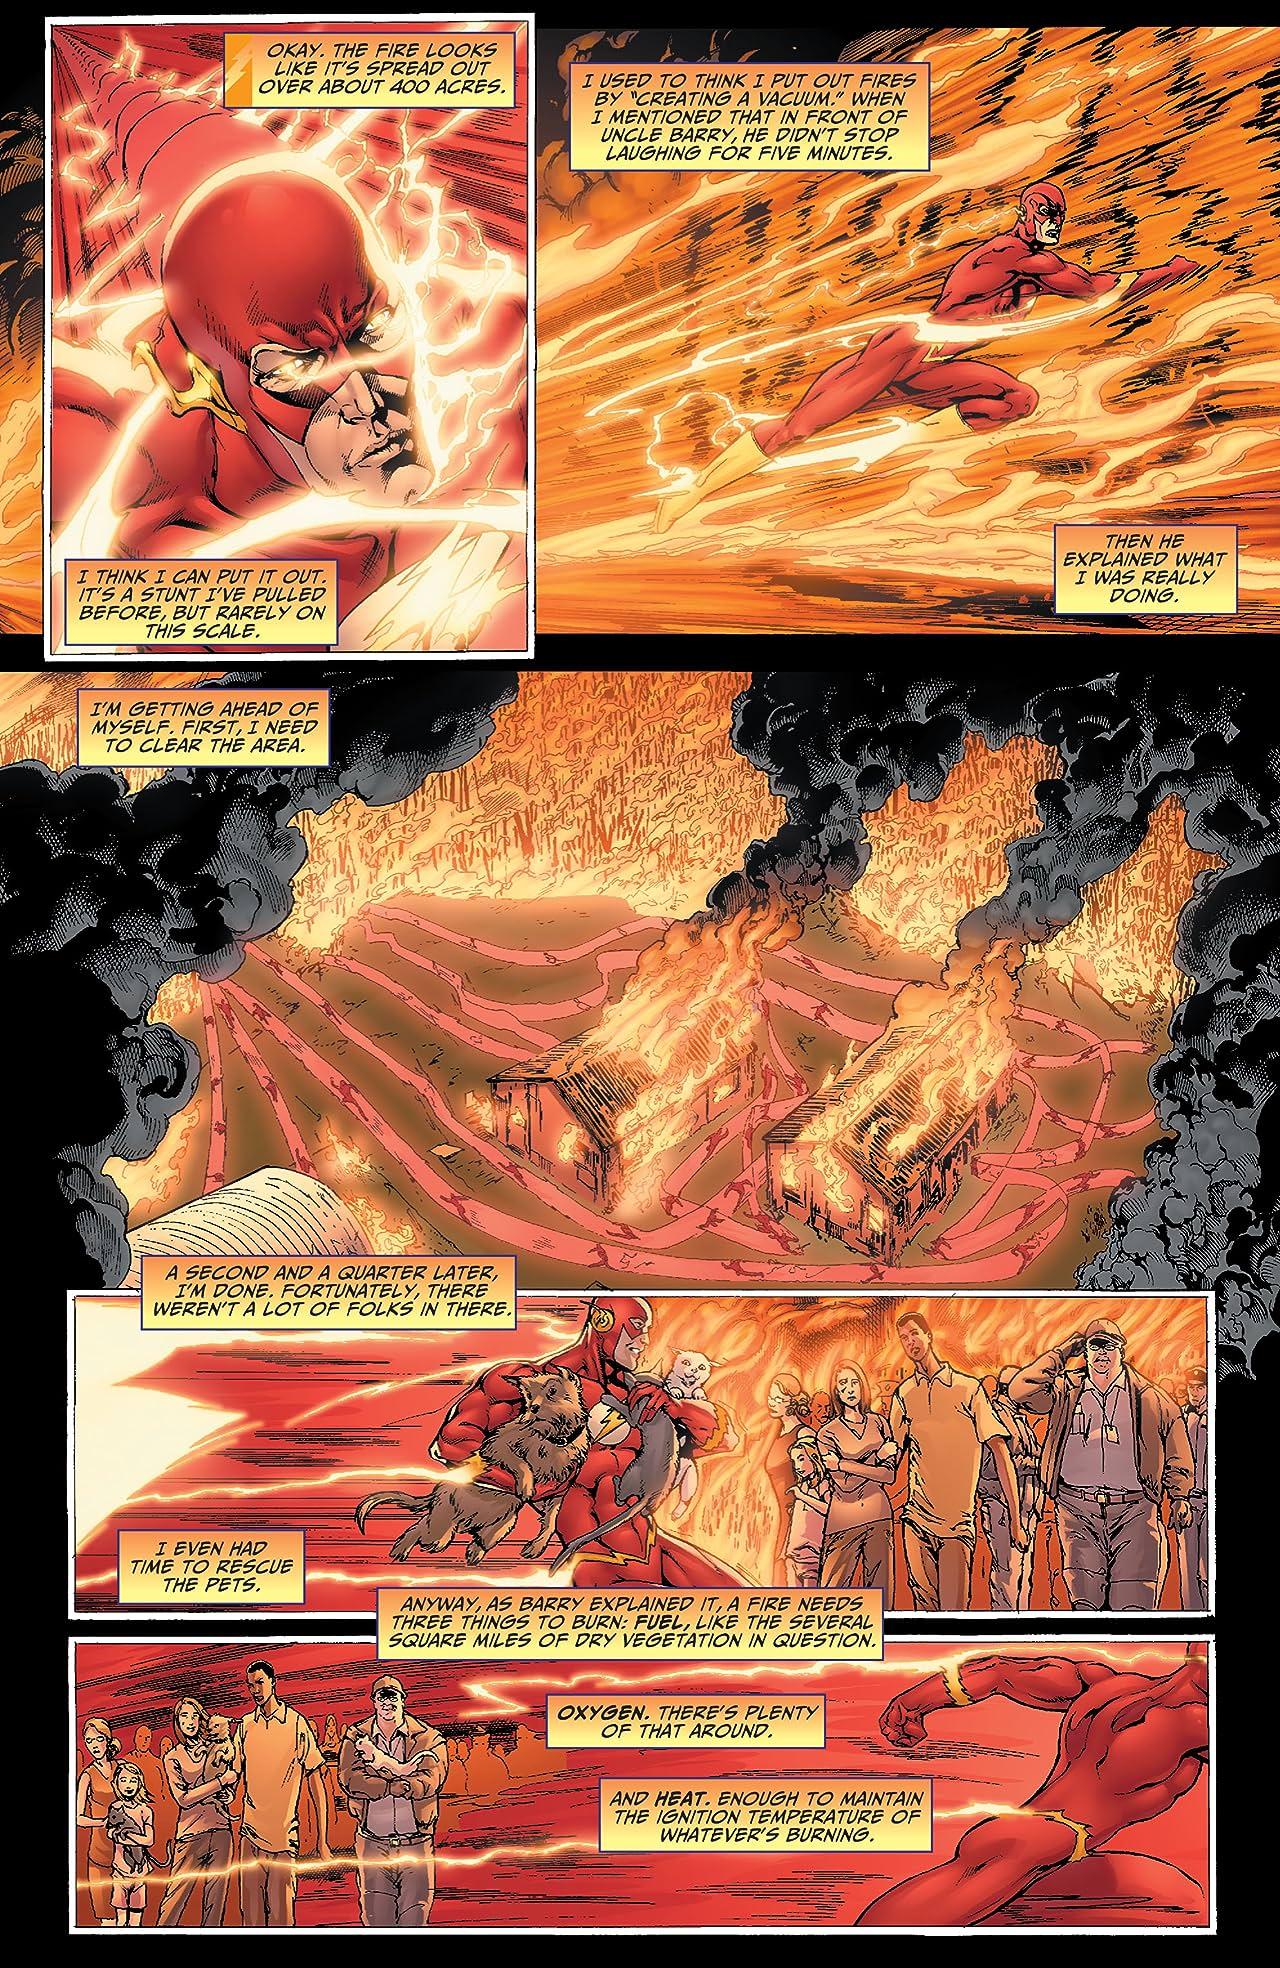 Justice League of America (2006-2011) #20